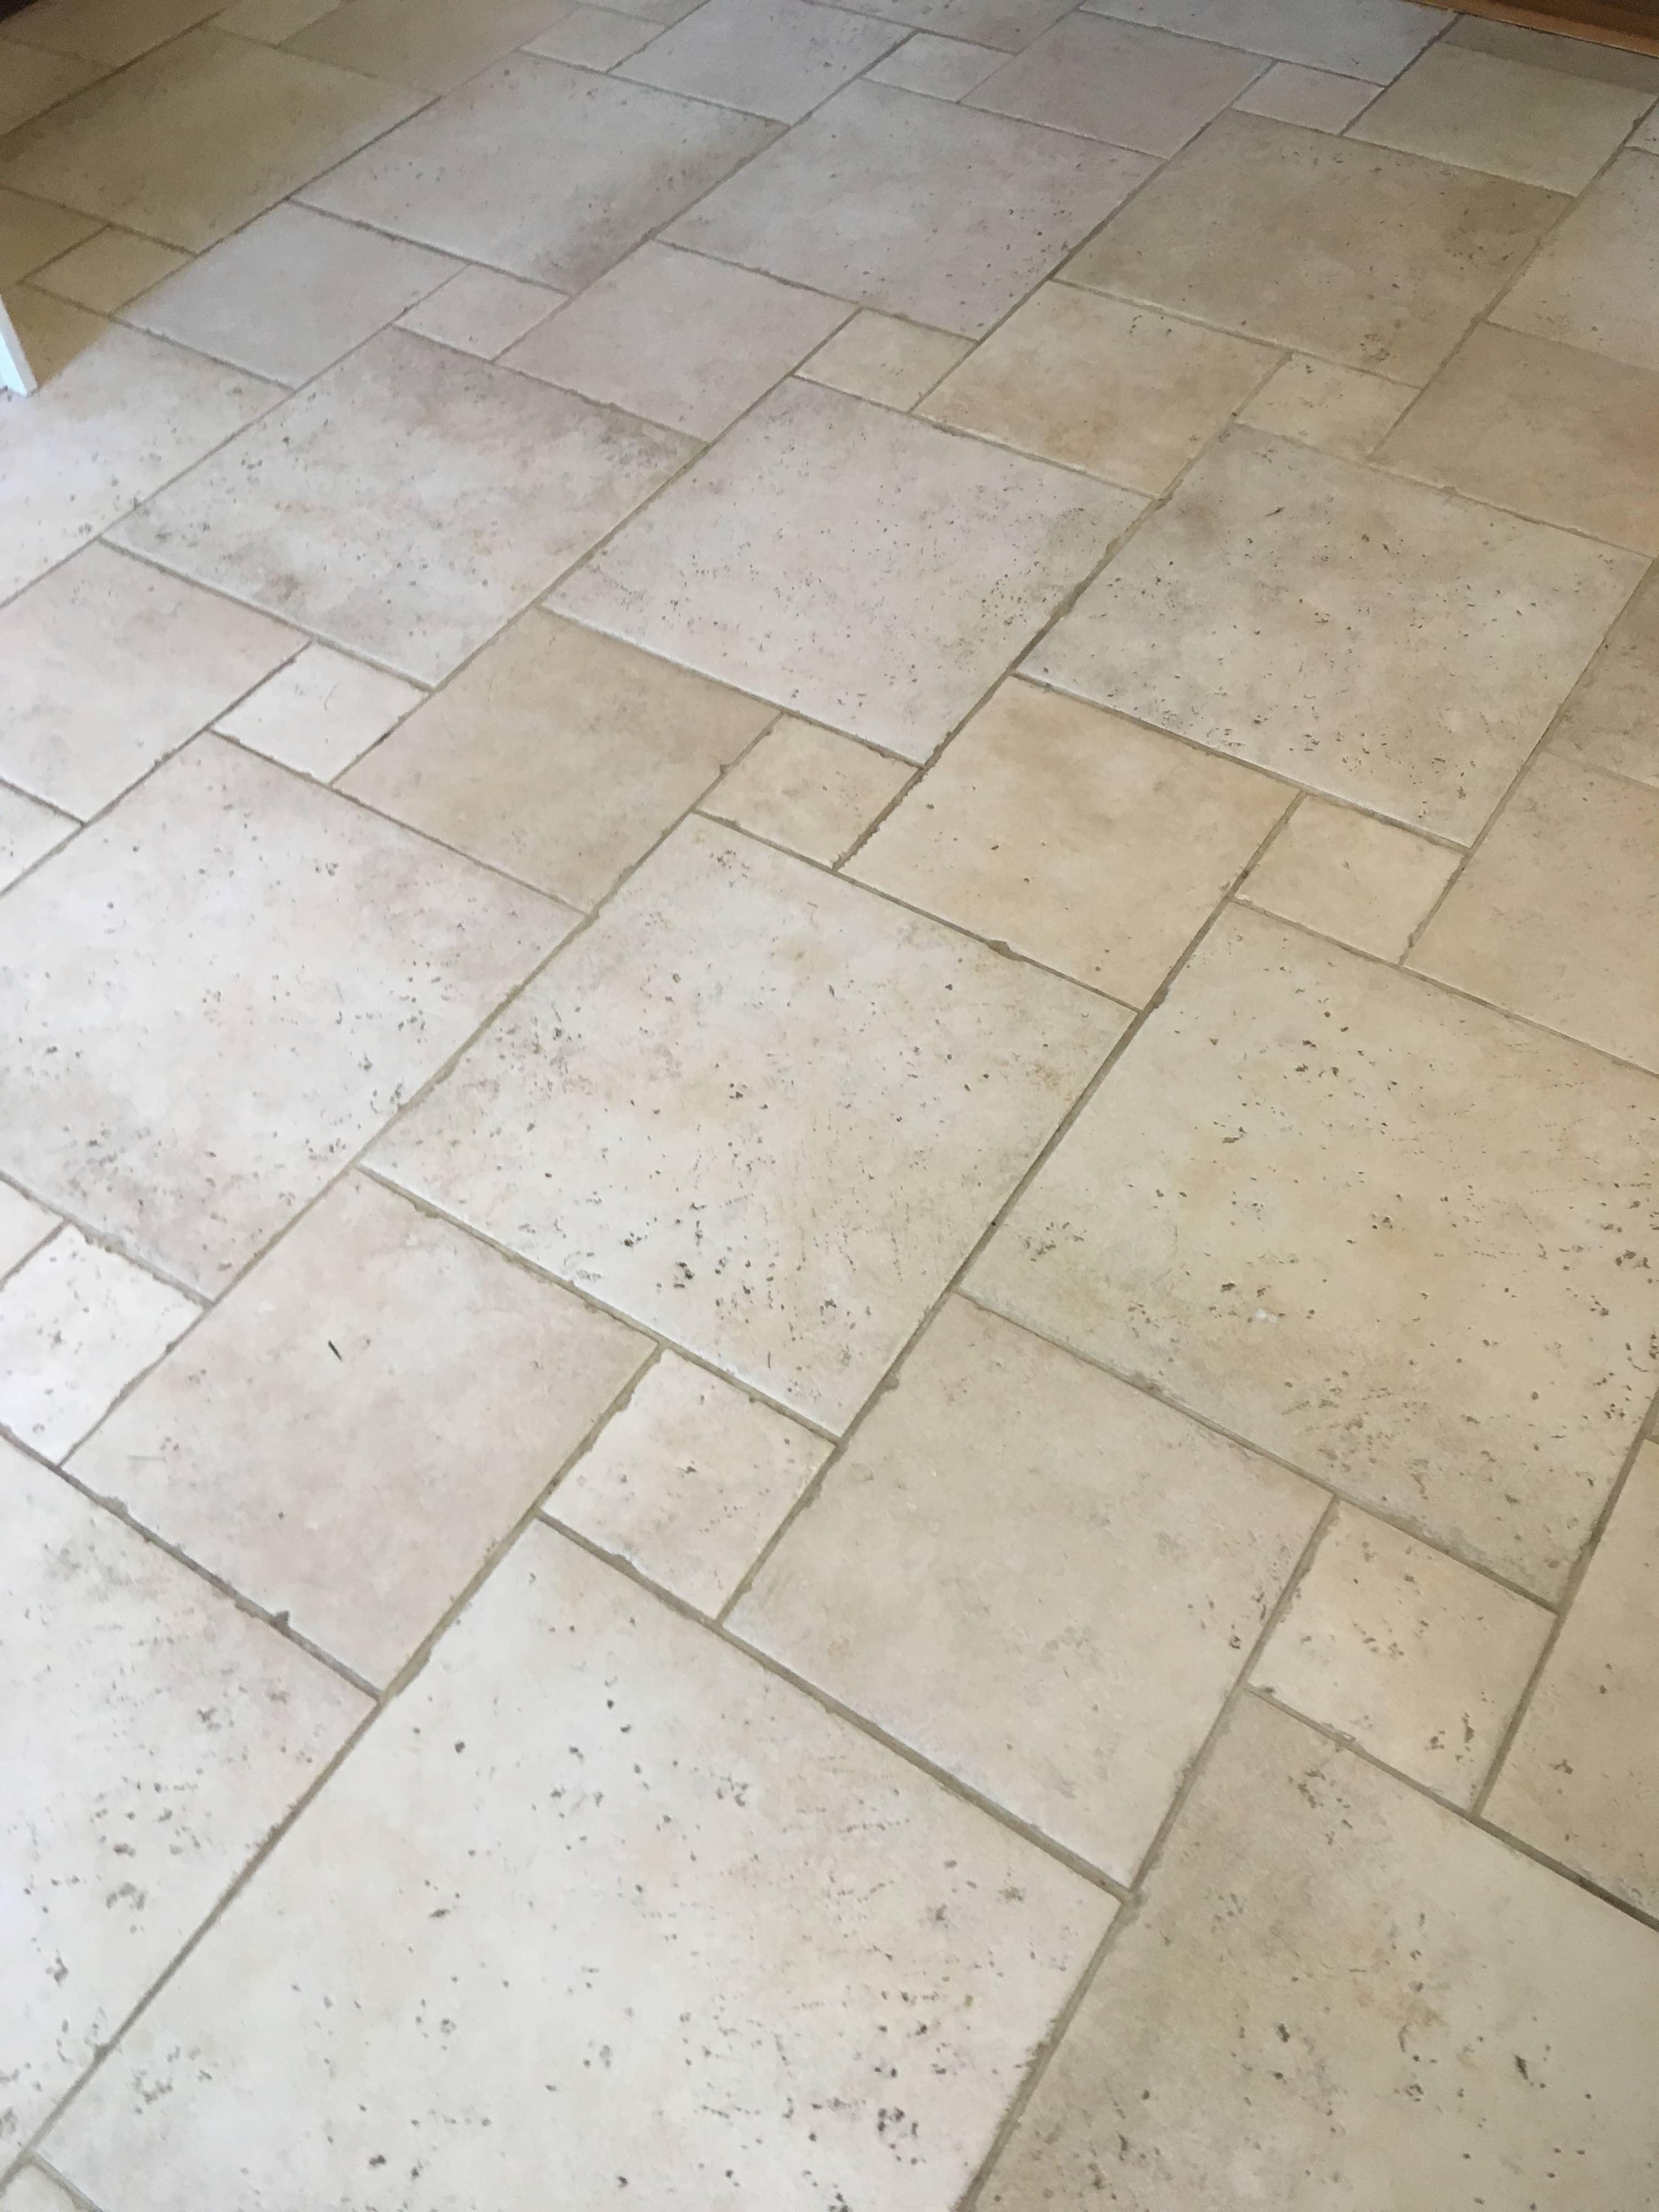 Porcelain Tile  Floor Before Cleaning Shepperton